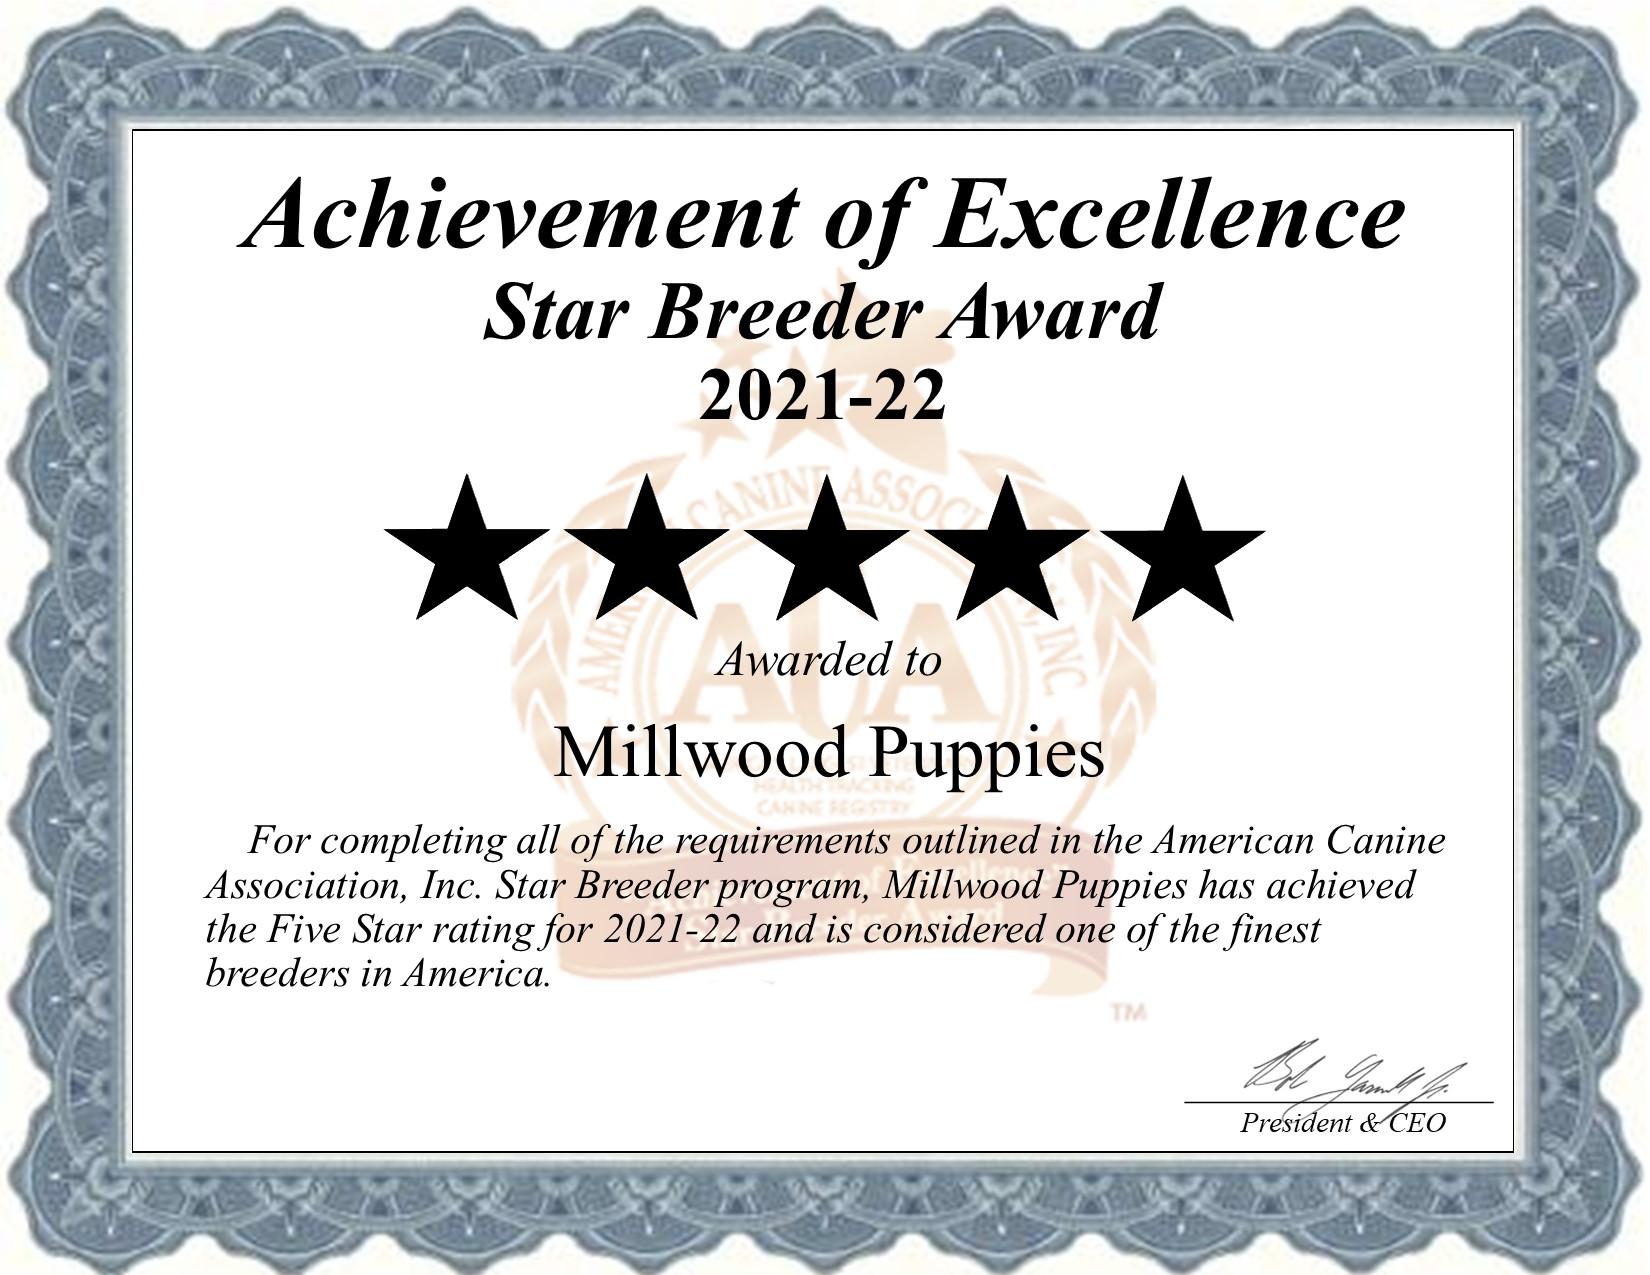 Millwood, Puppies, dog, breeder, star, certificate, Millwood-Puppies, Gap, PA, Pennsylvania, puppy, dog, kennels, mill, puppymill, usda, 5-star, aca, ica, registered, Bernadoodle, 17353